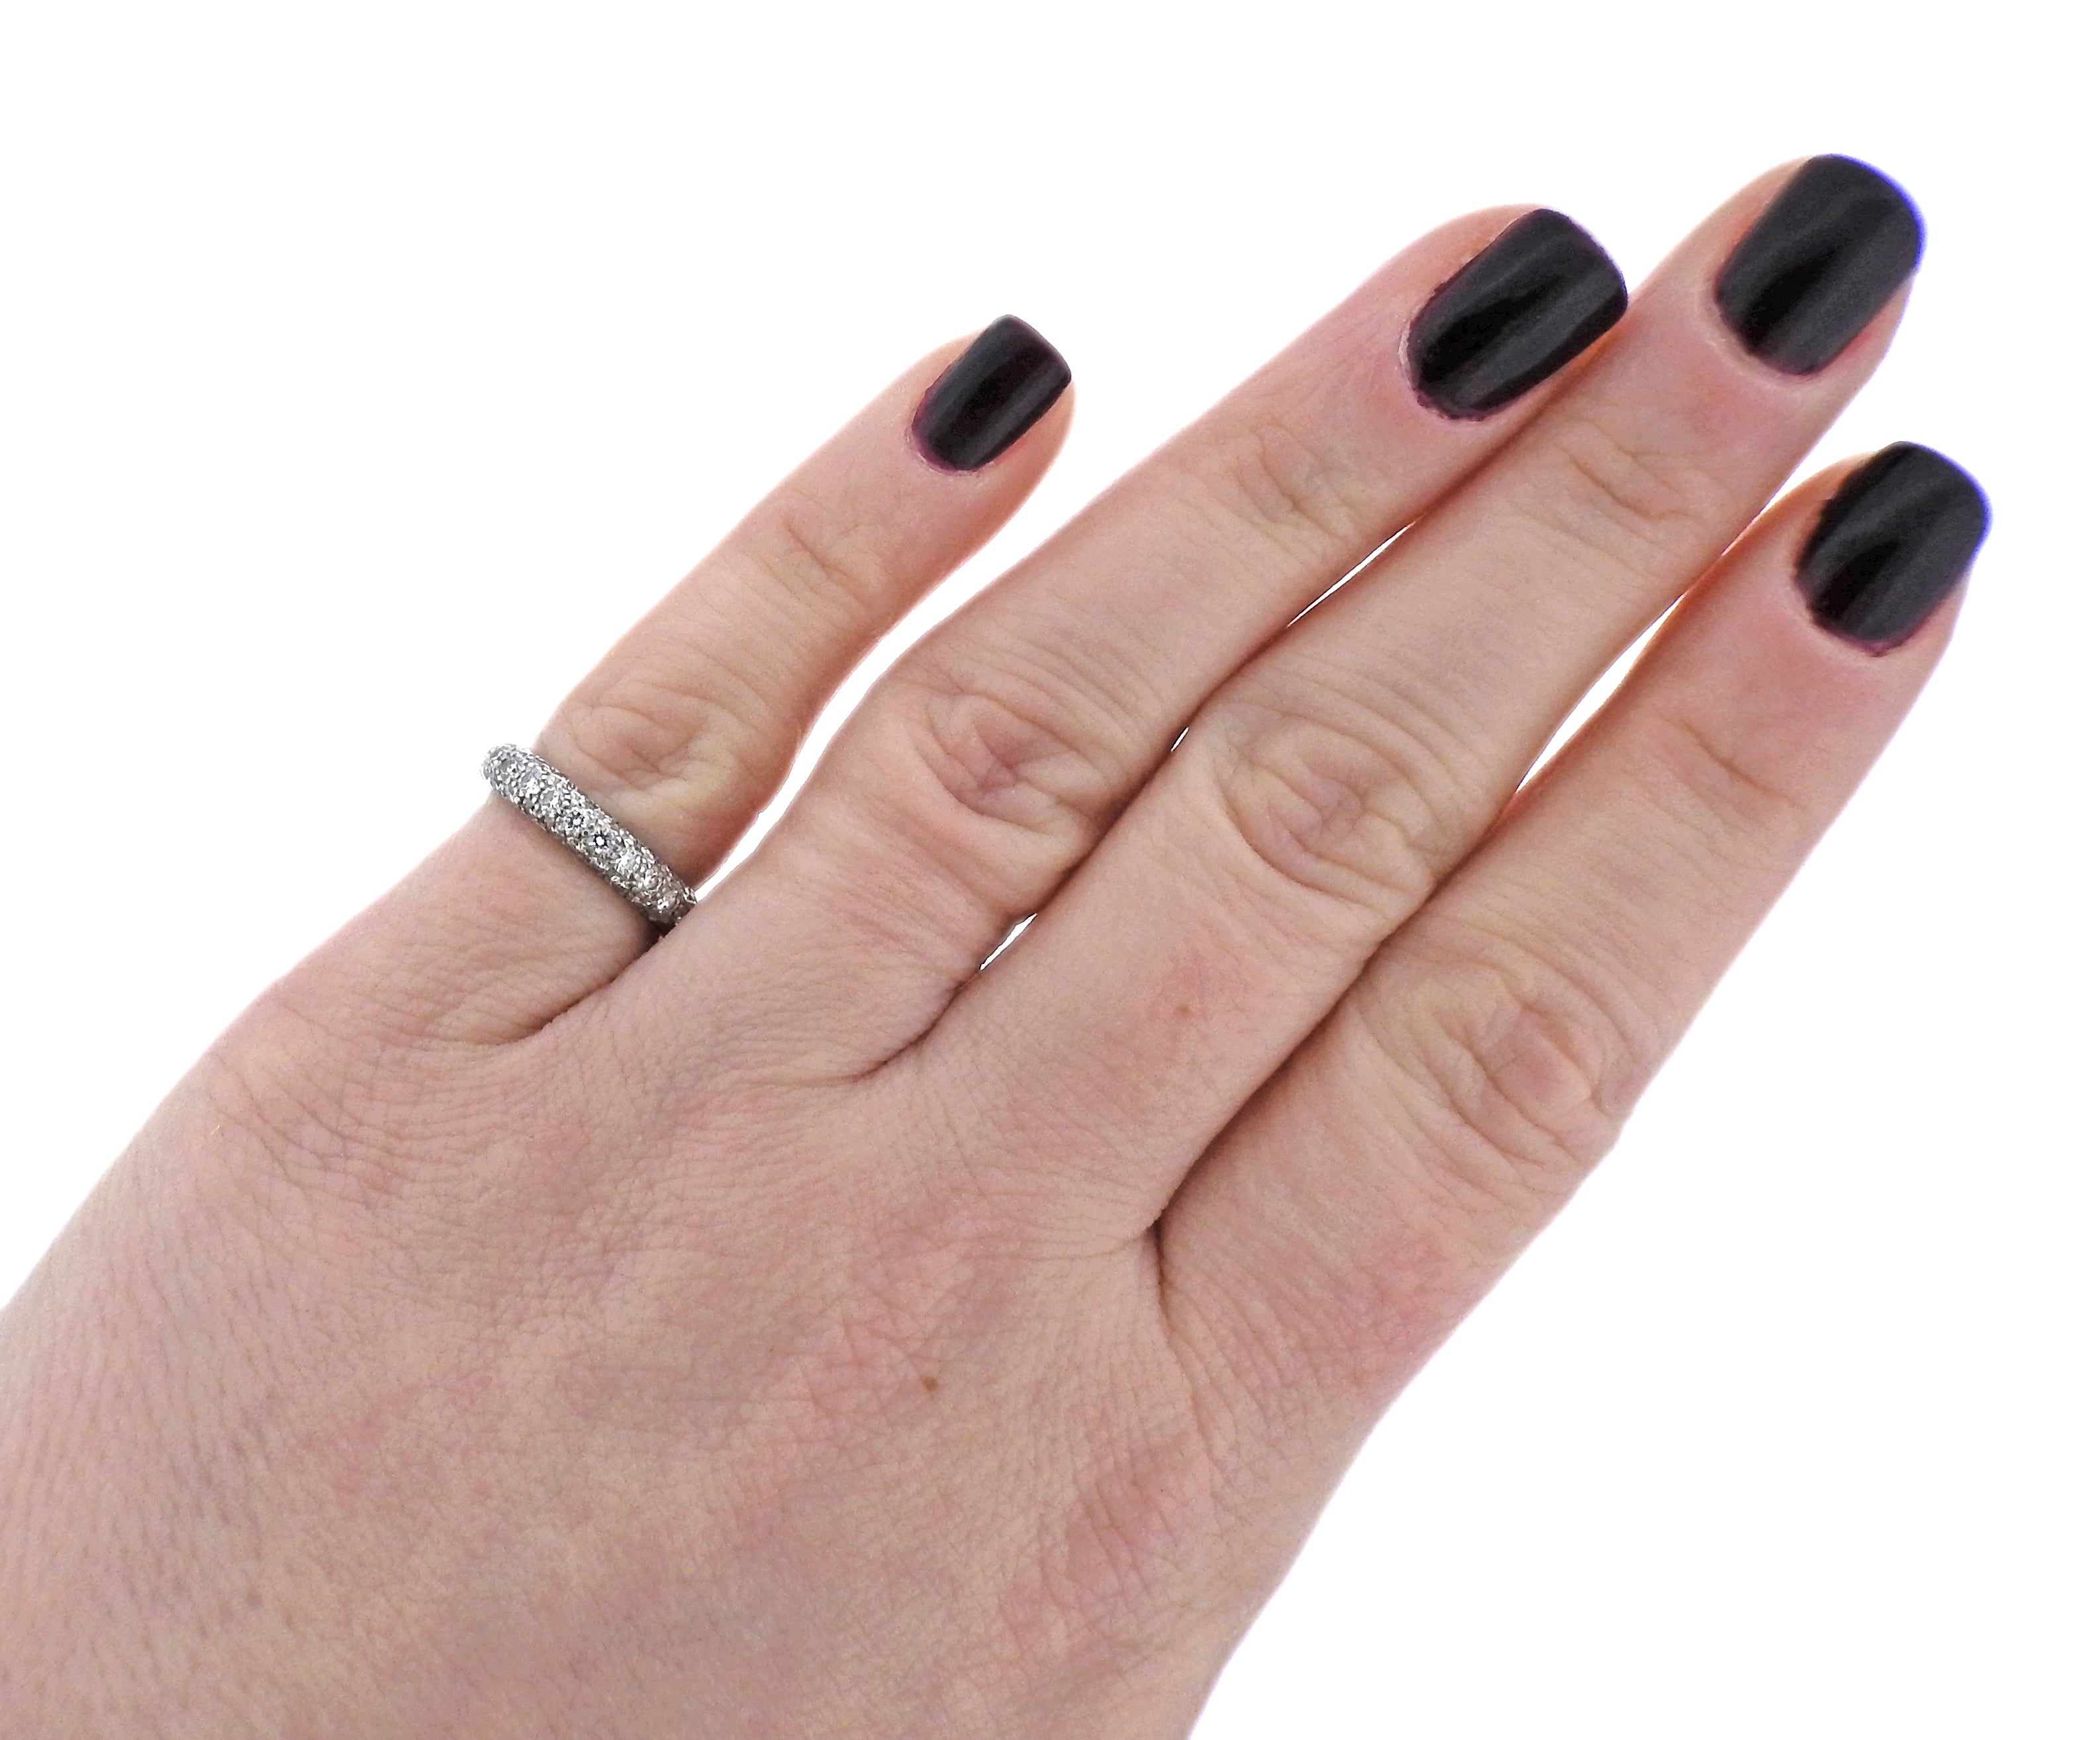 Tiffany and Co Etoile Diamond Platinum Wedding Band Ring at 1stdibs